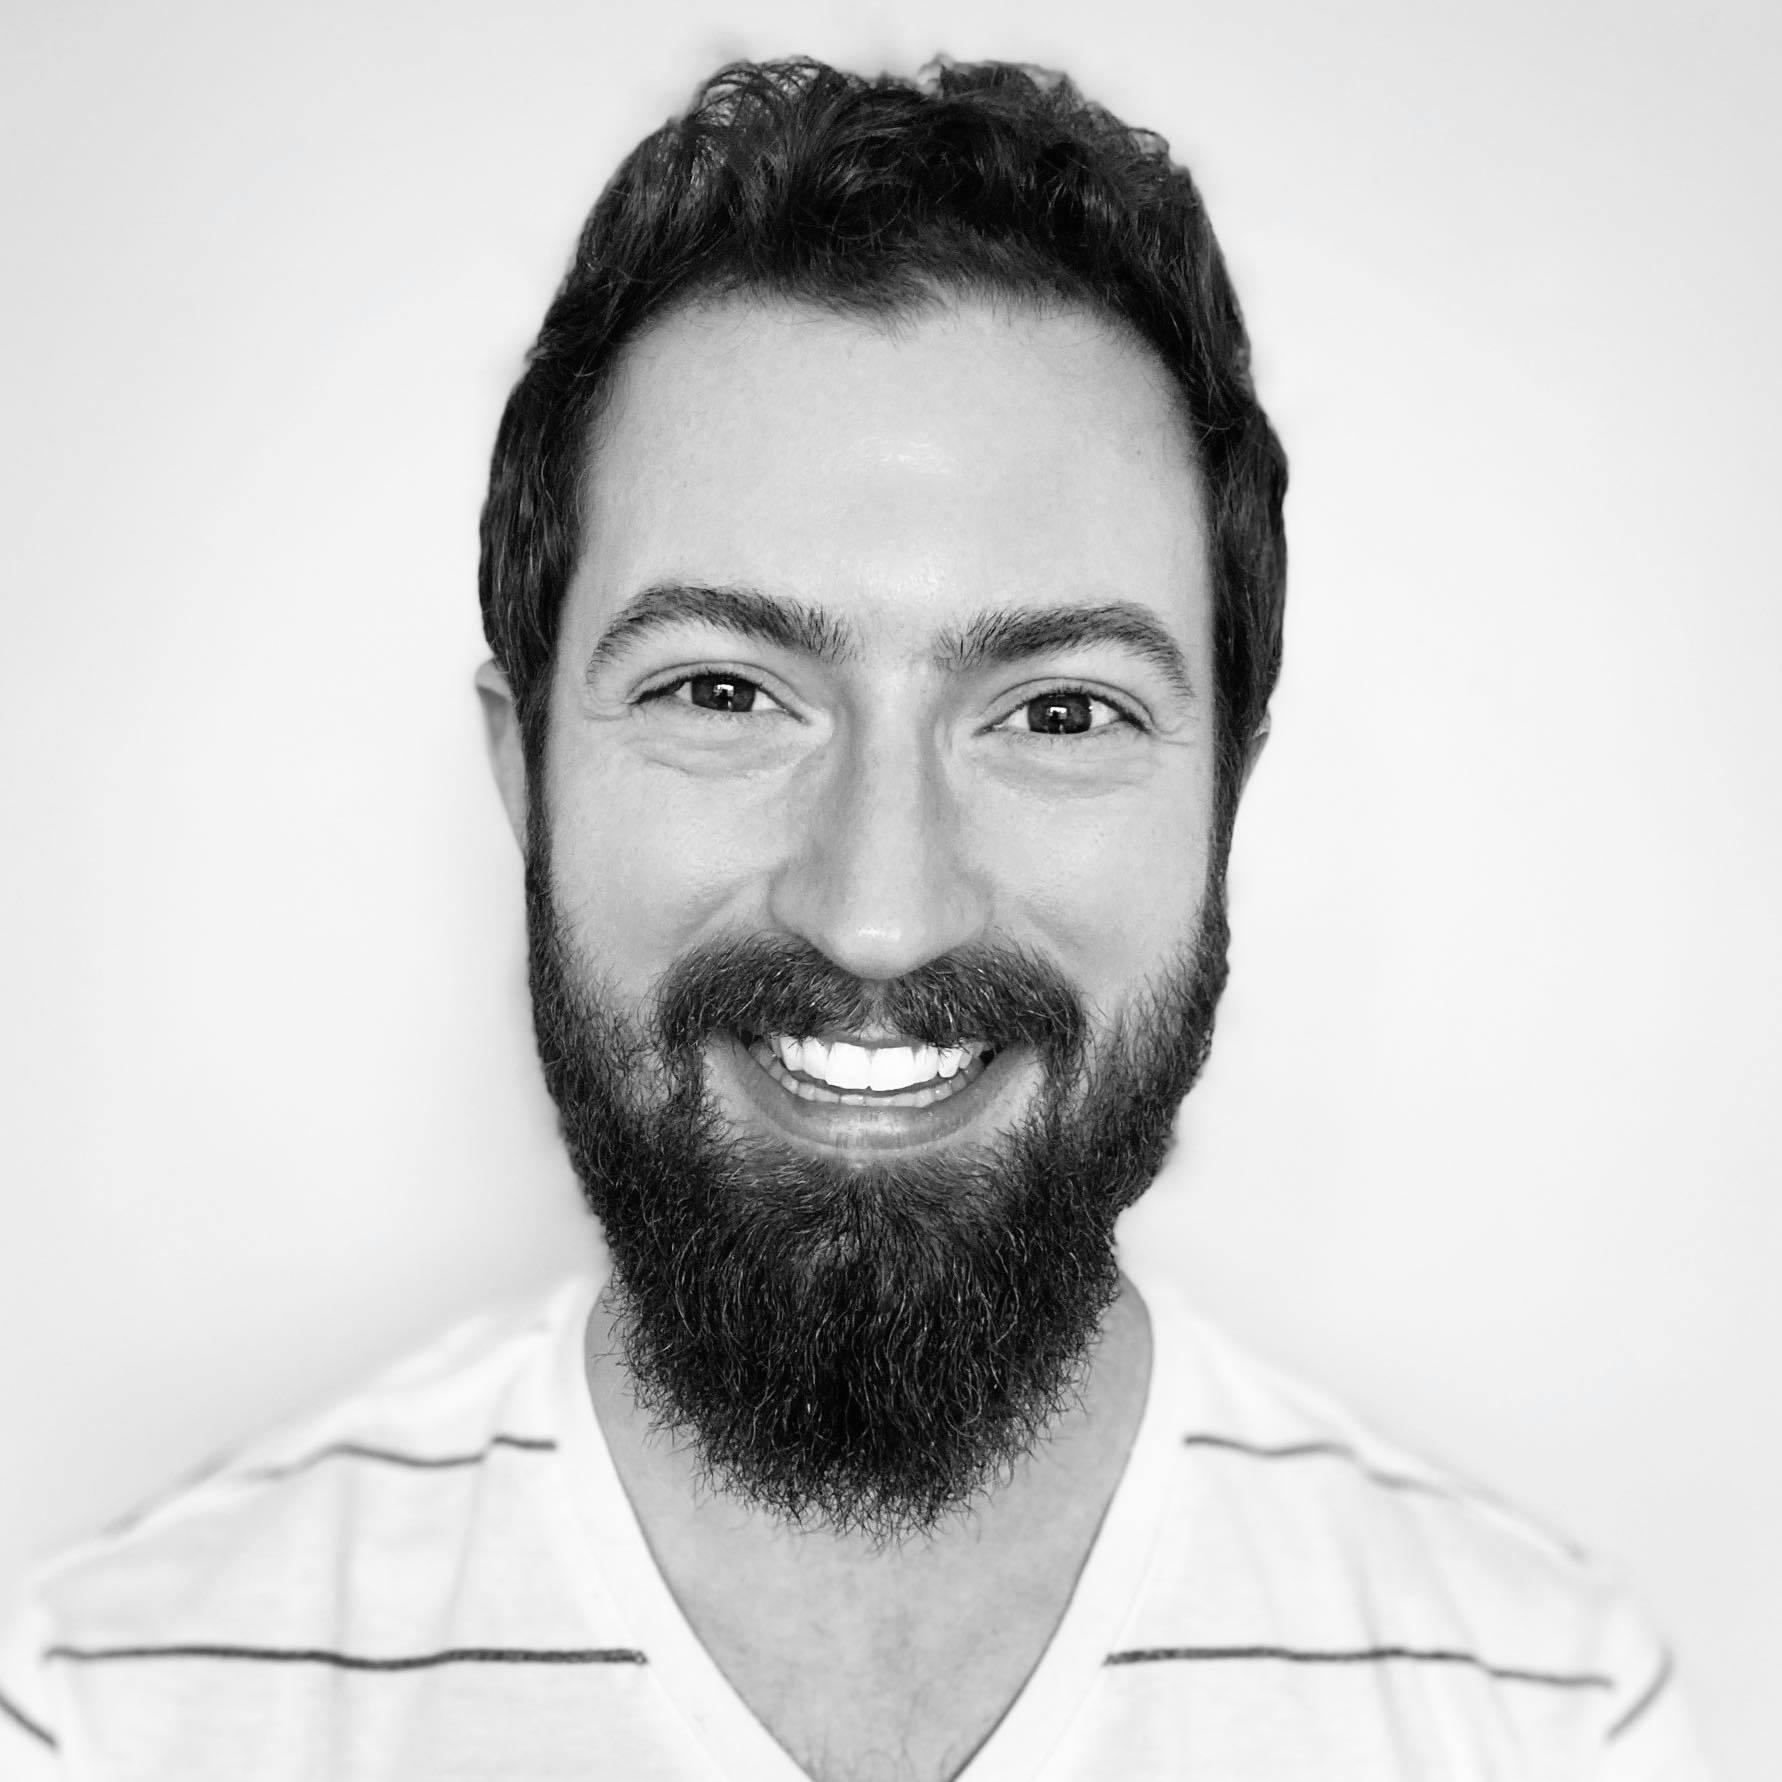 Vince Pontillo-Verrastro profile